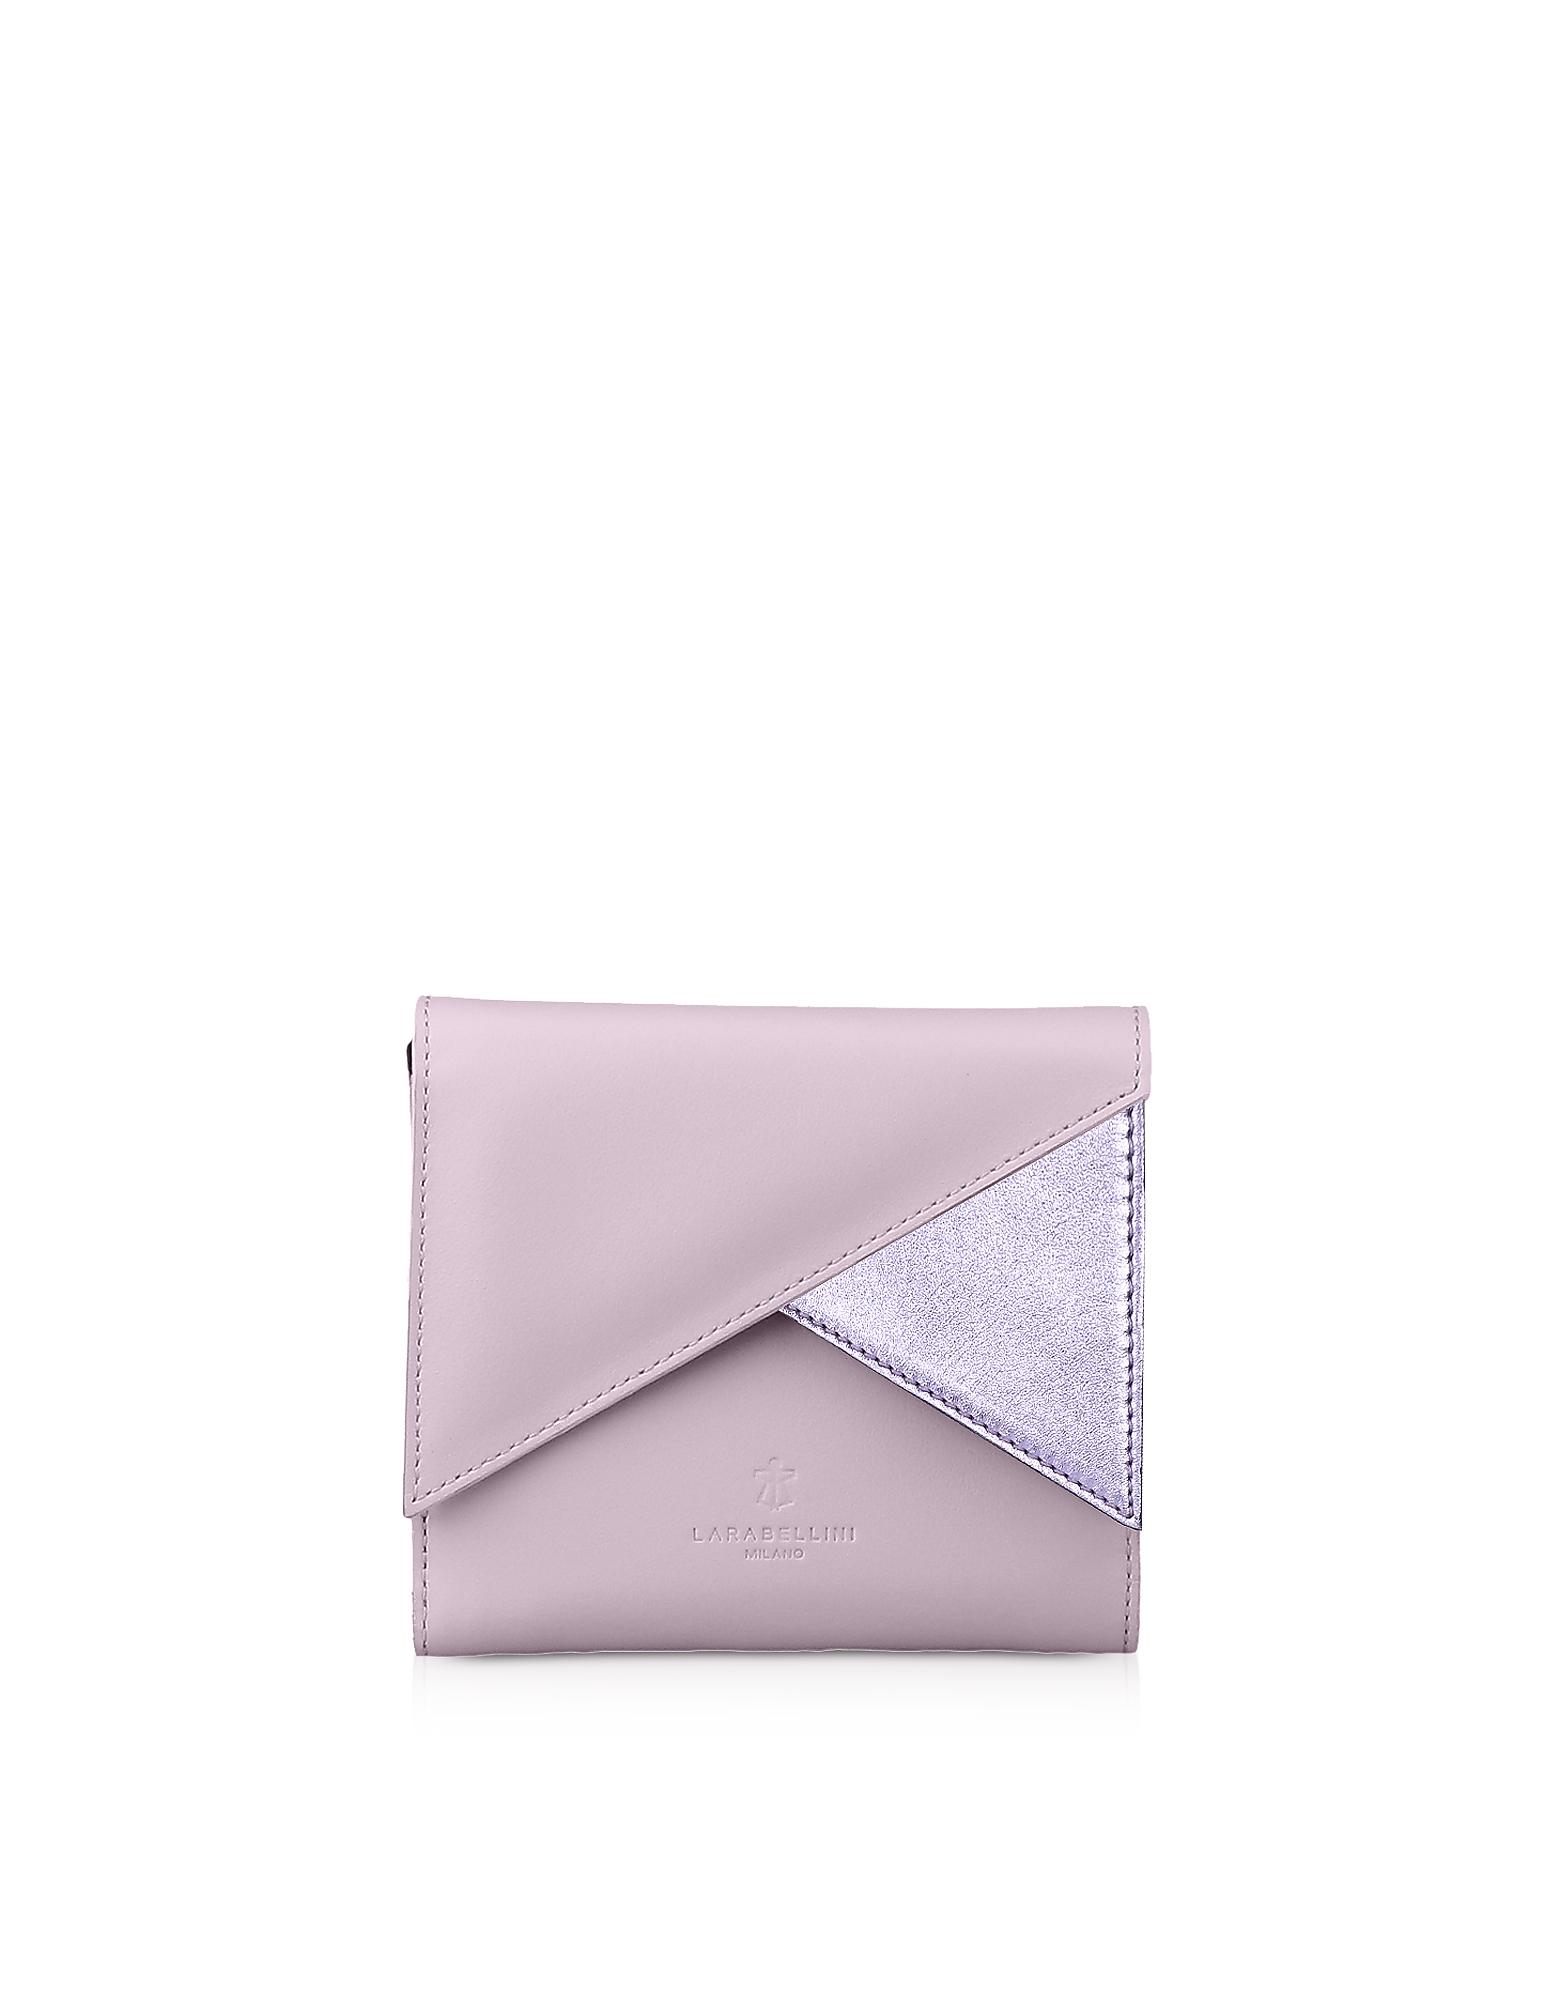 Lara Bellini Designer Wallets, Pink Leather Vela Women